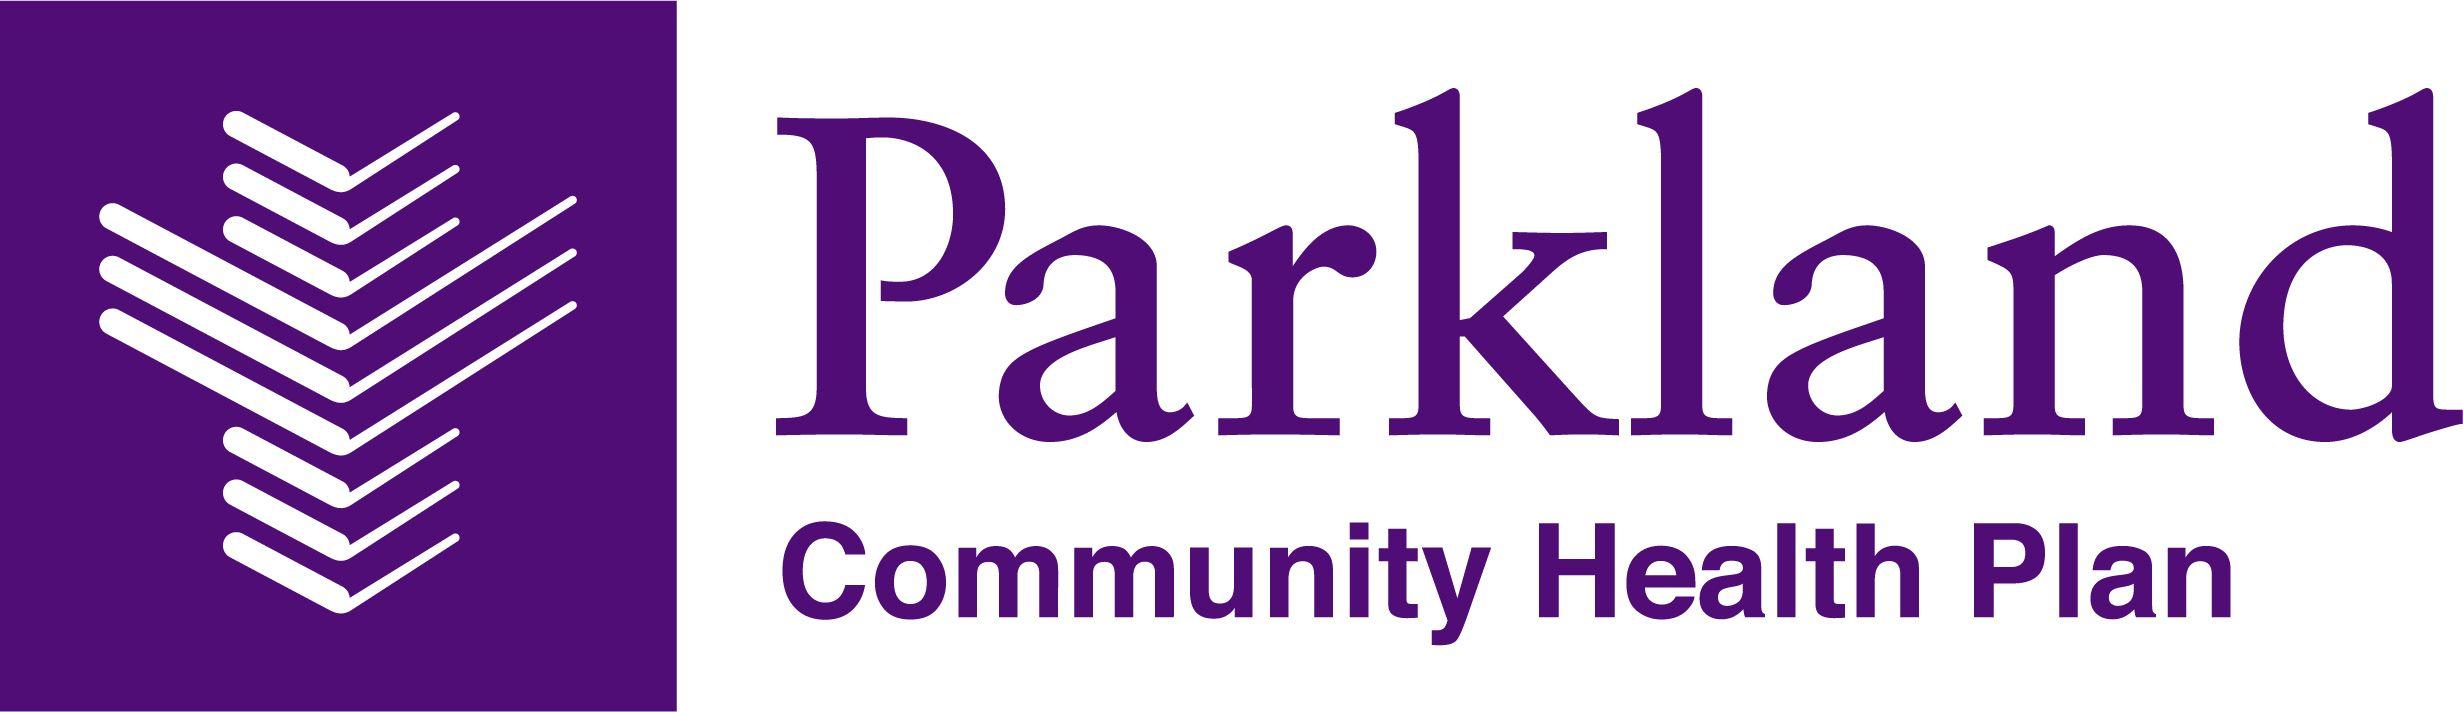 Parkland Community Health Plan, Inc.